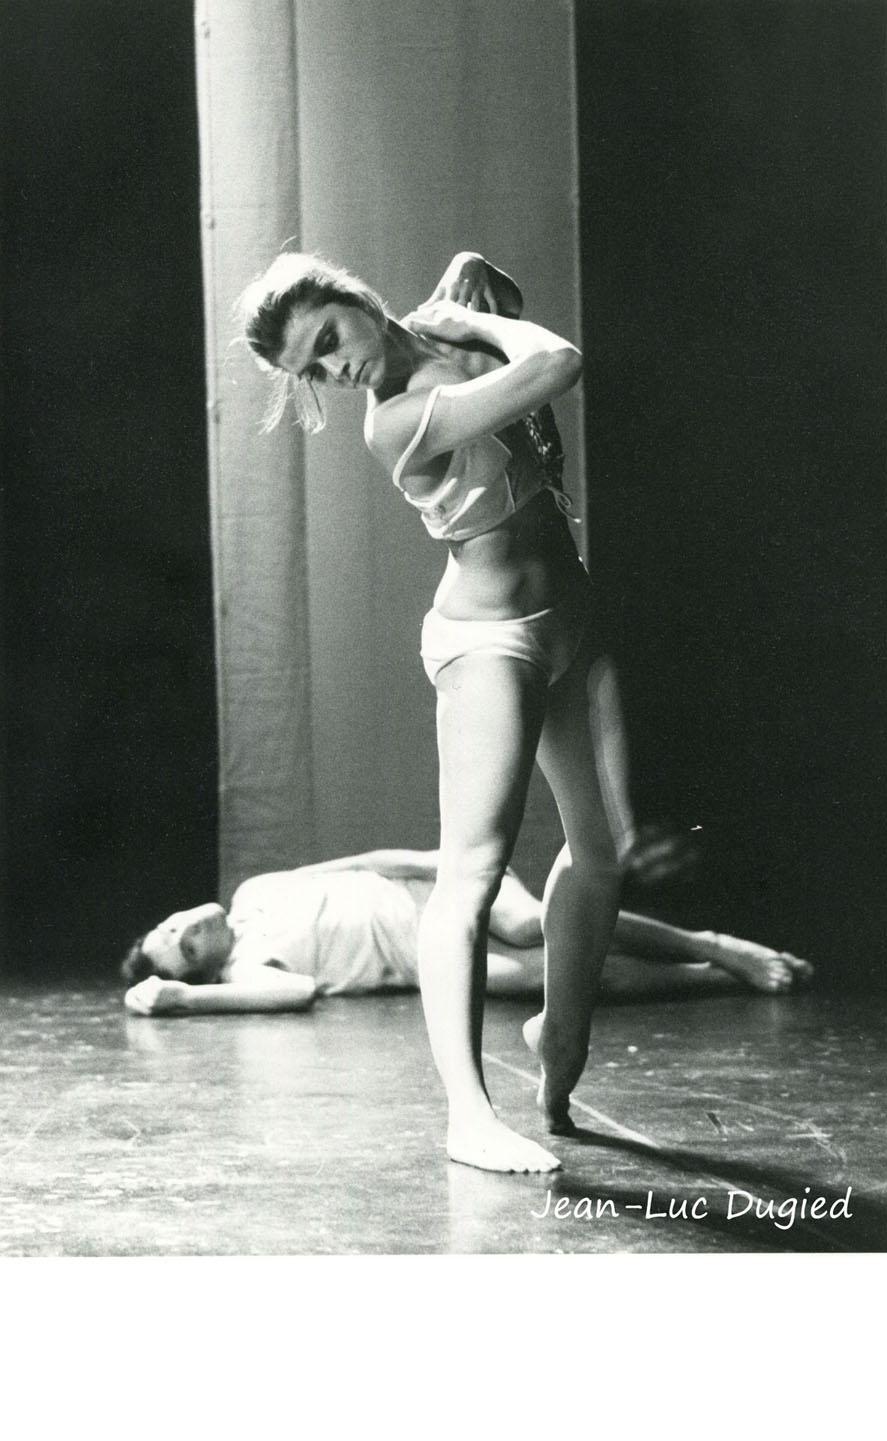 39 Dugied Fabrice - bohème - Bernard Collin et Geneviève Mazin - 1988